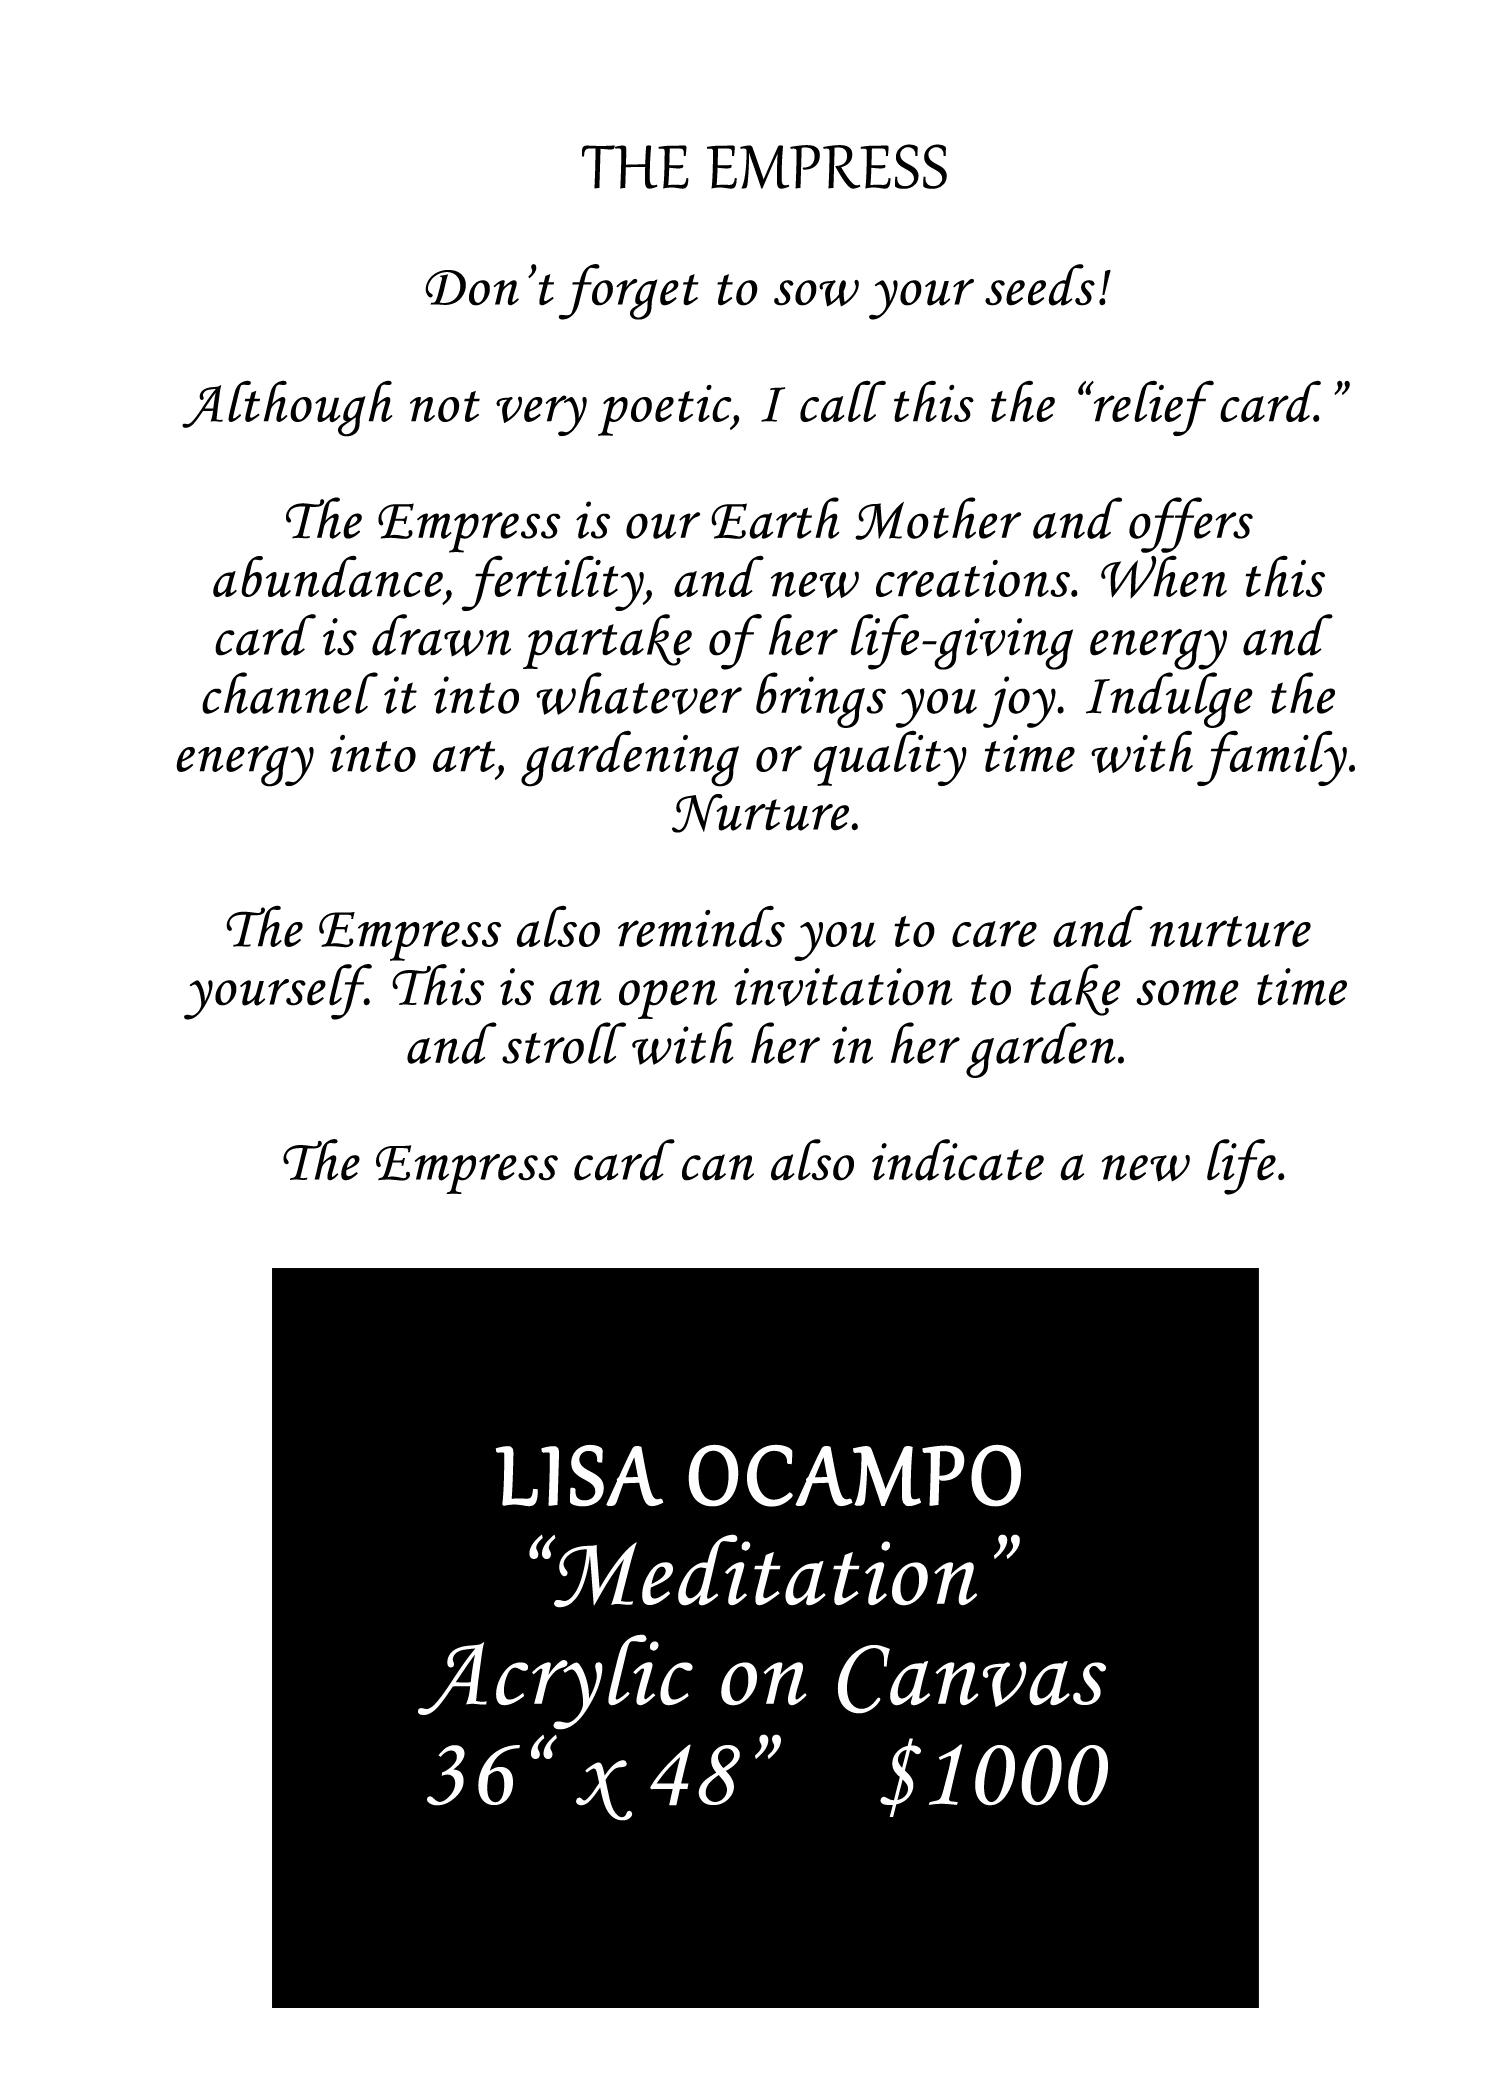 Lisa-Ocampo-The-Empress-5.jpg